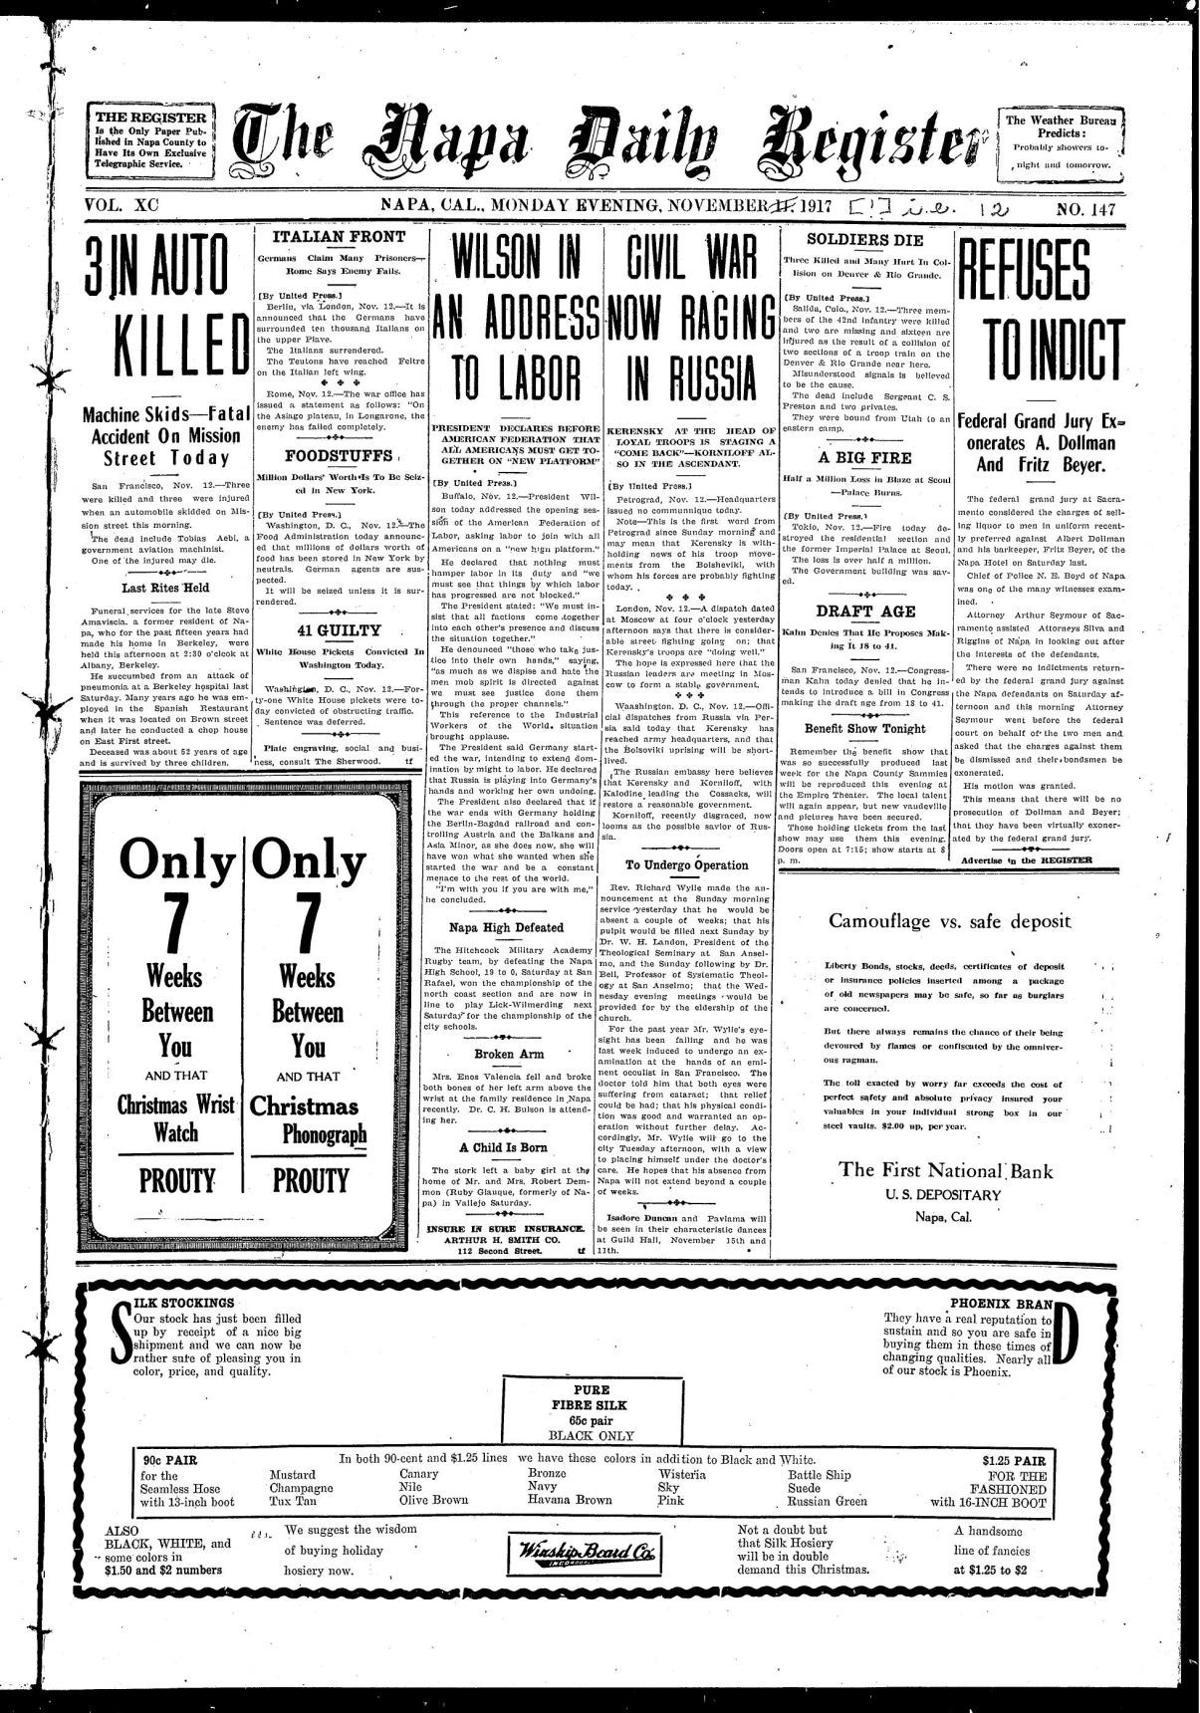 Nov. 12, 1917